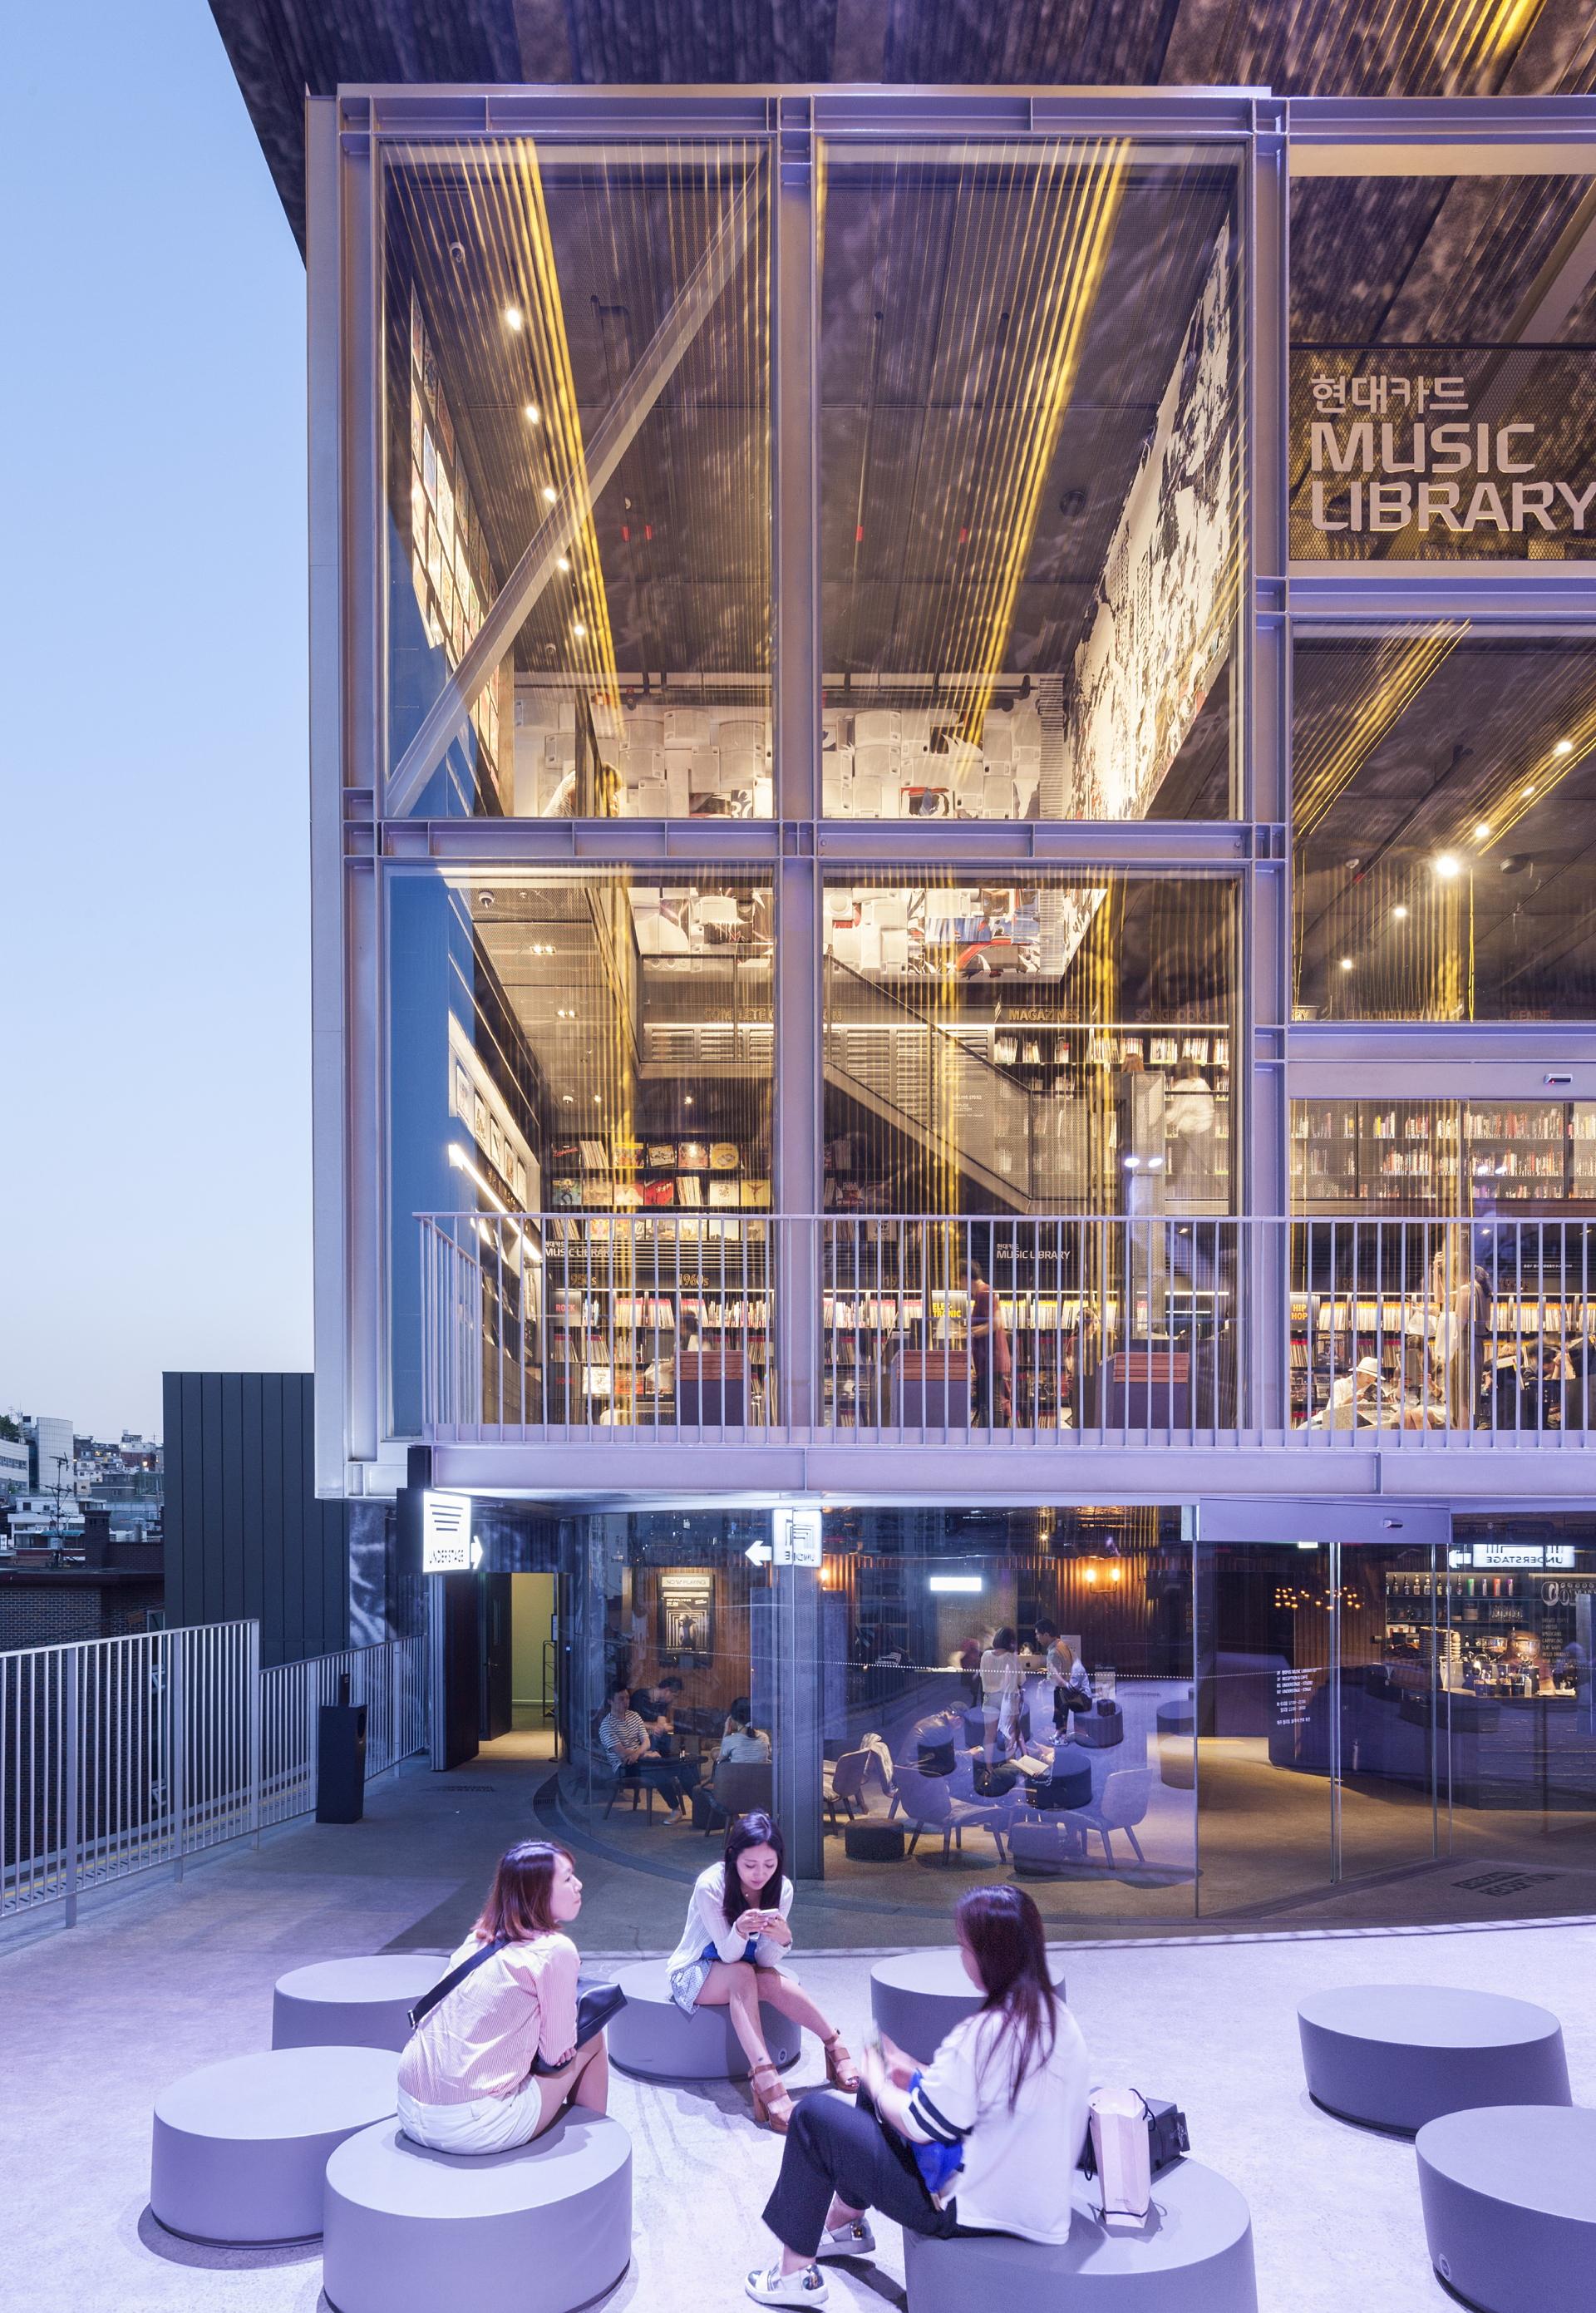 Moongyu Choi + Ga.A Architects: H Music Library en Seúl